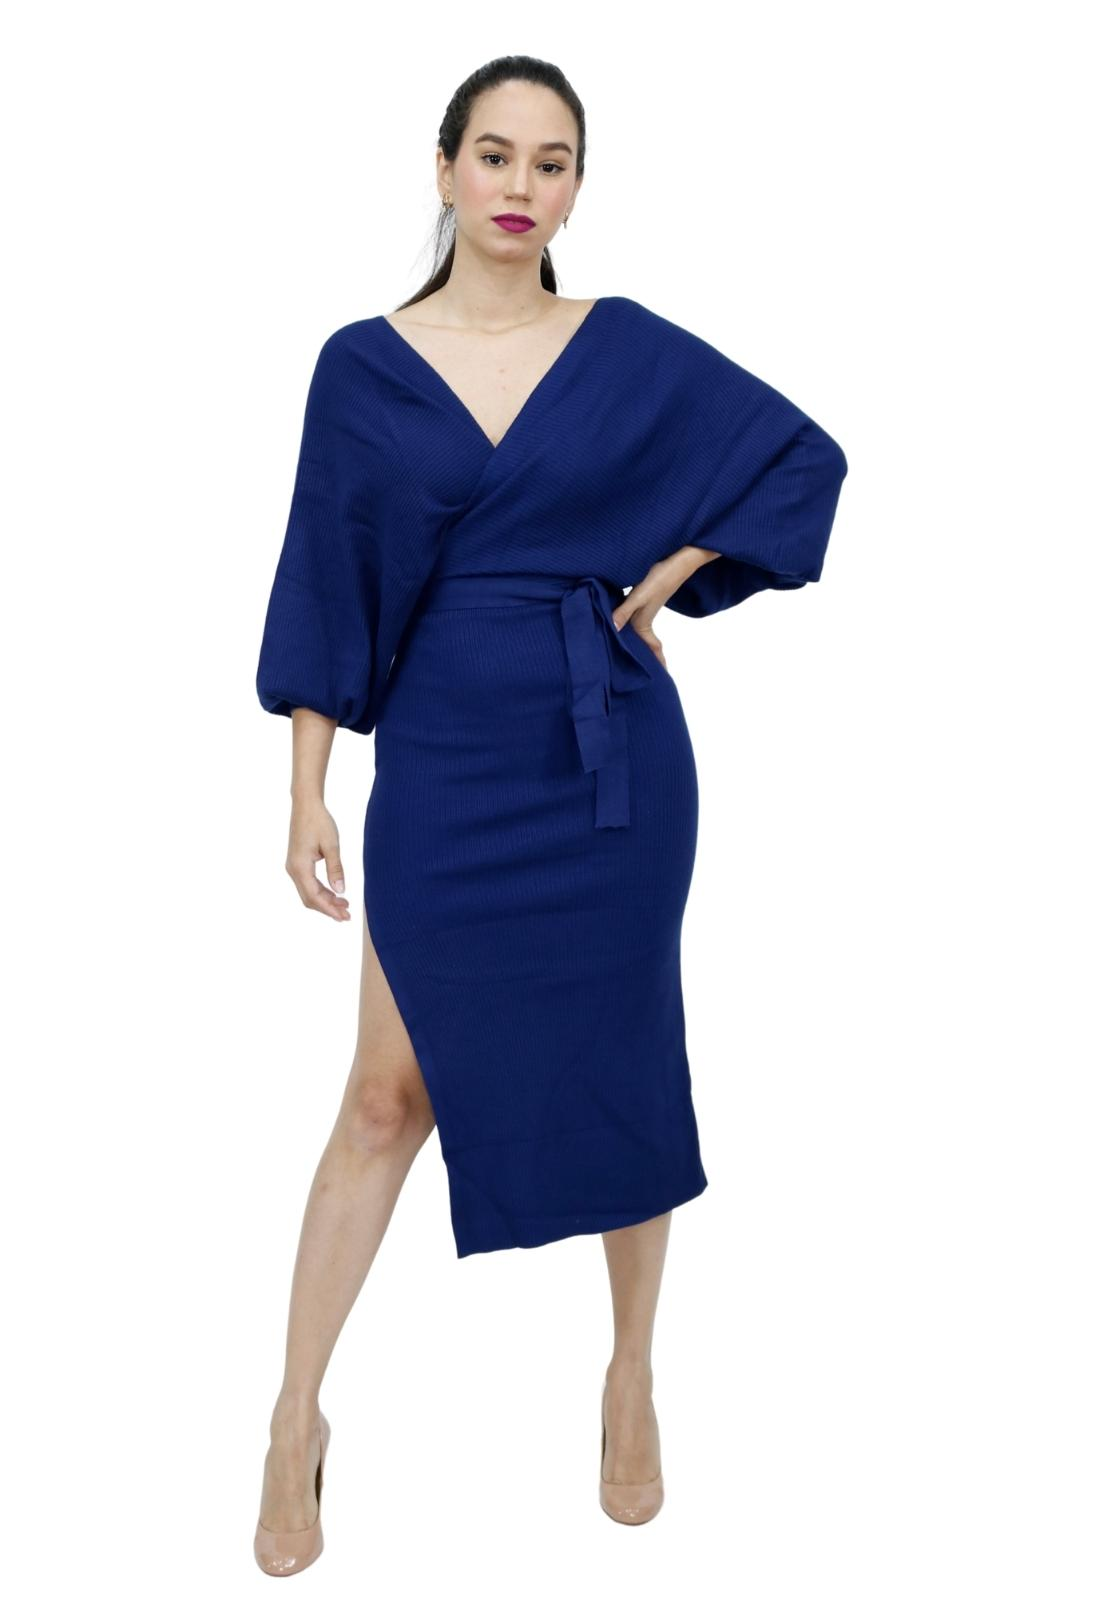 Vestido Tricot Com Faixa Transpasse Fenda Lateral